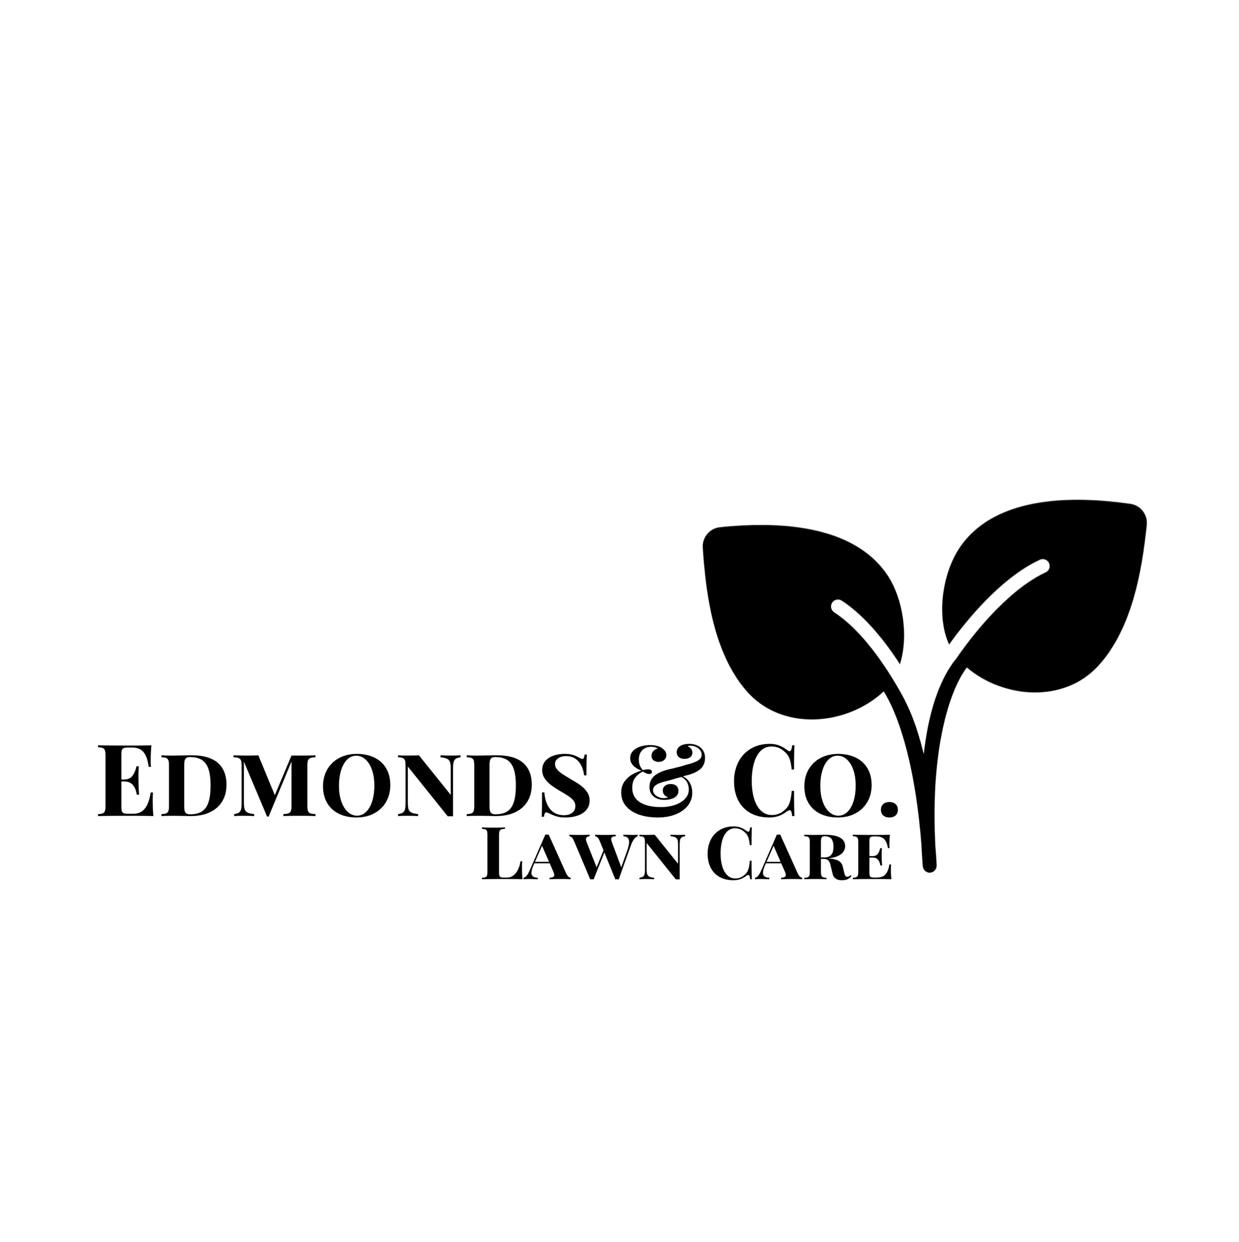 Edmonds & Co. Lawn Care